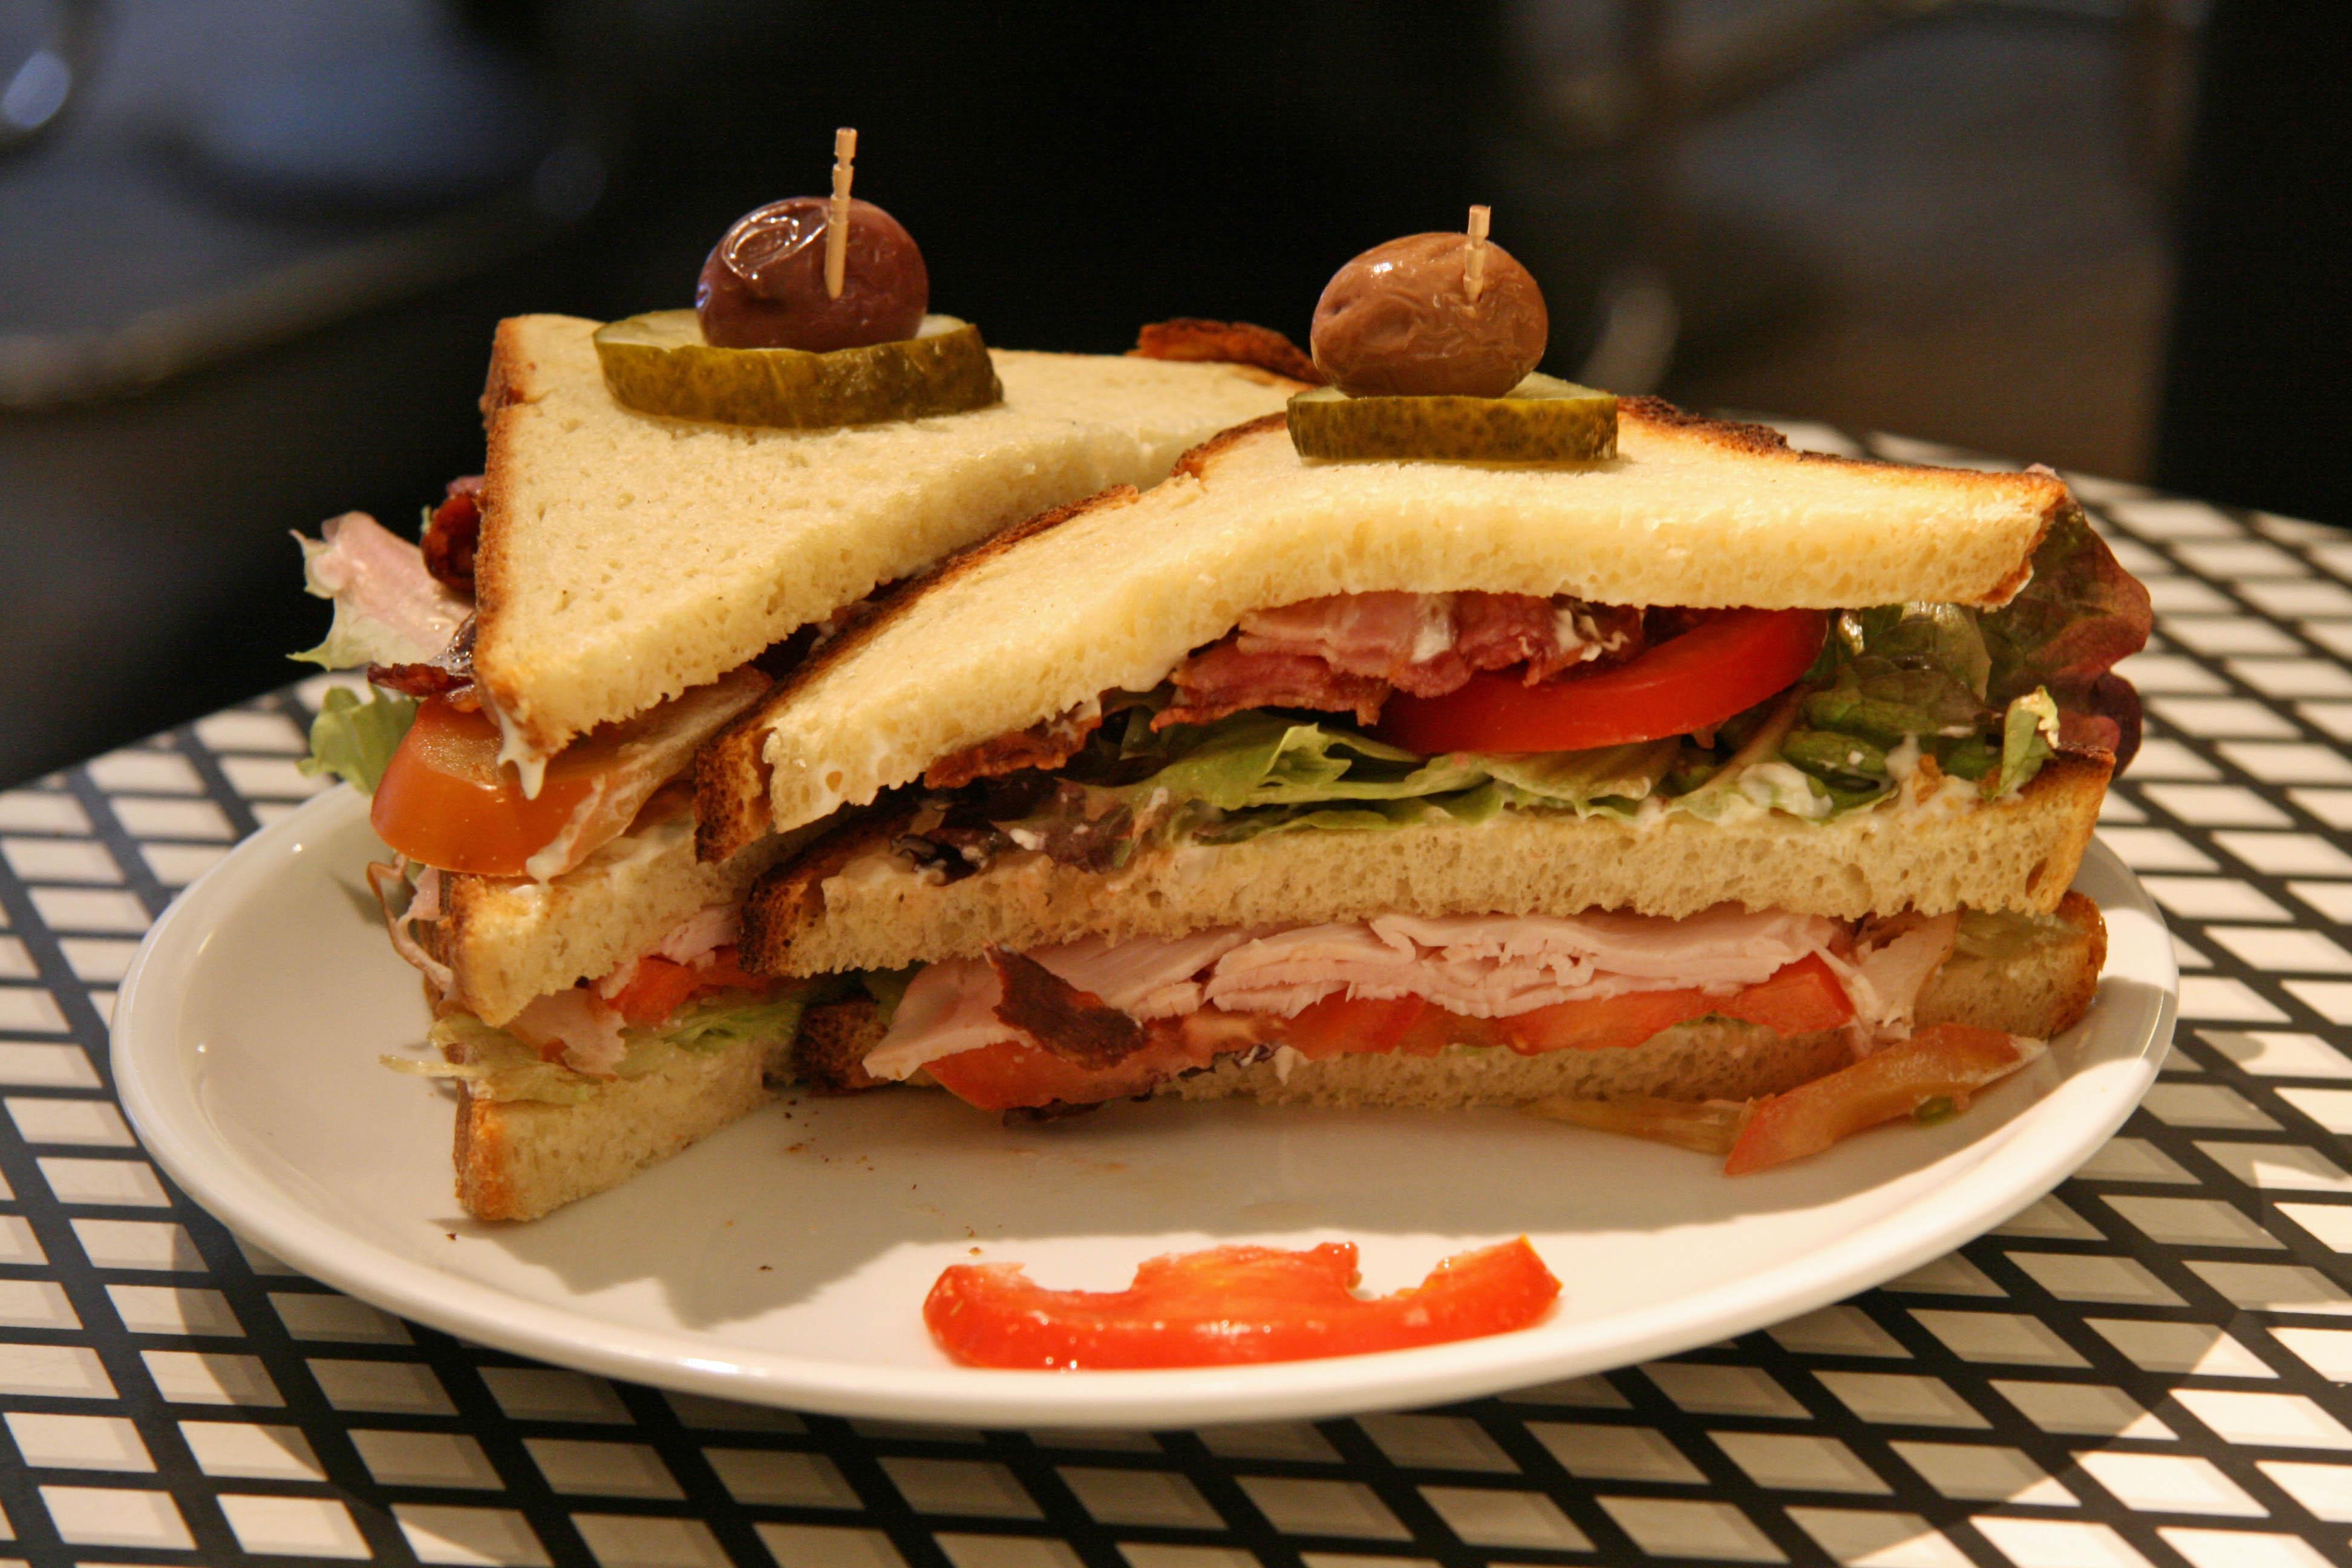 club-sandwich-auf-kartoffelbrot-at-baromis-deli